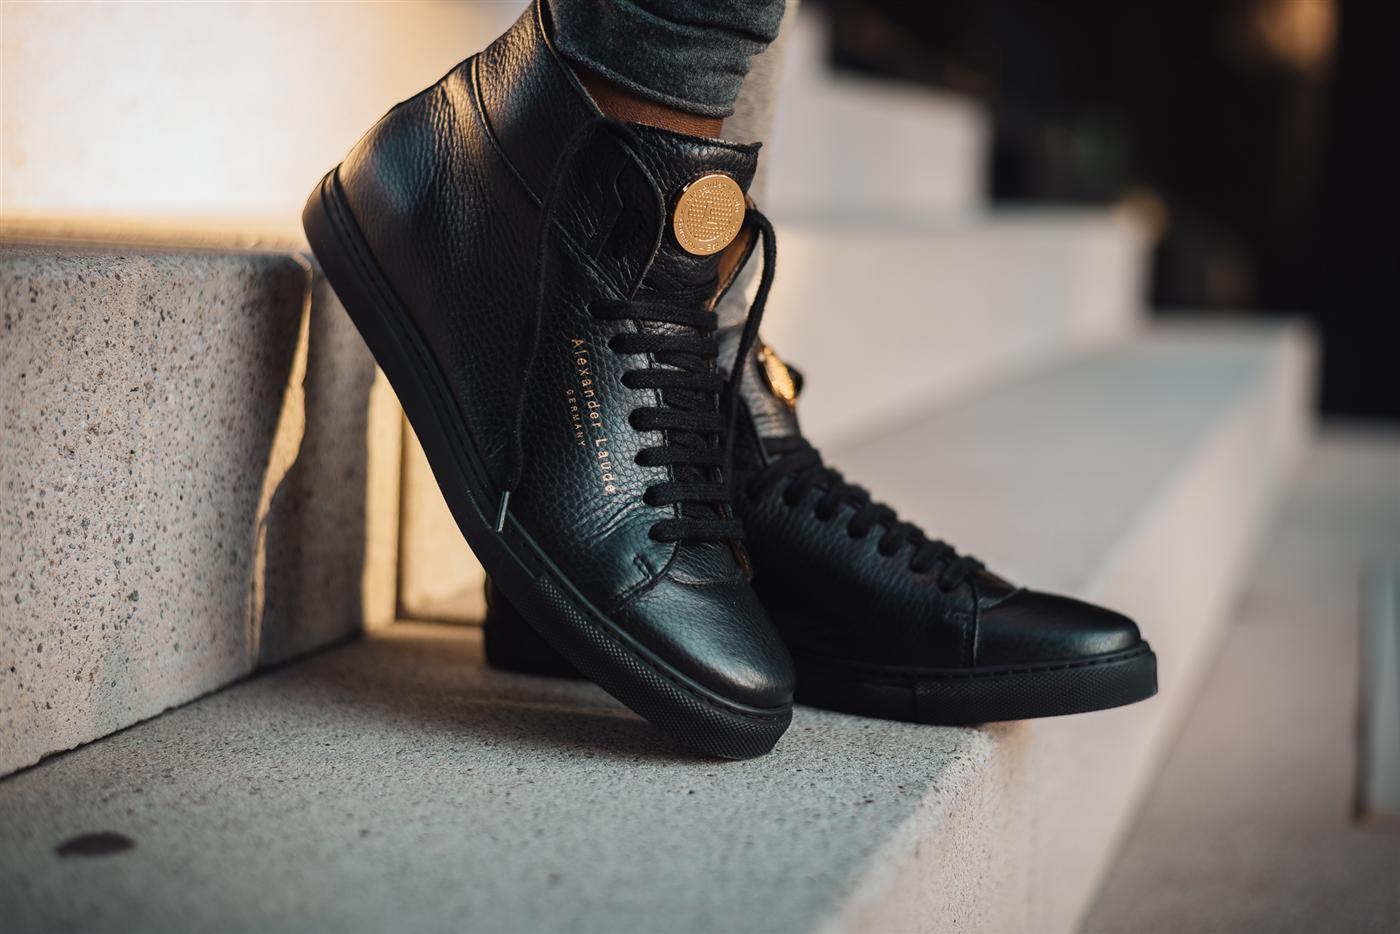 High-Top Sneaker by Alexander Laude 4